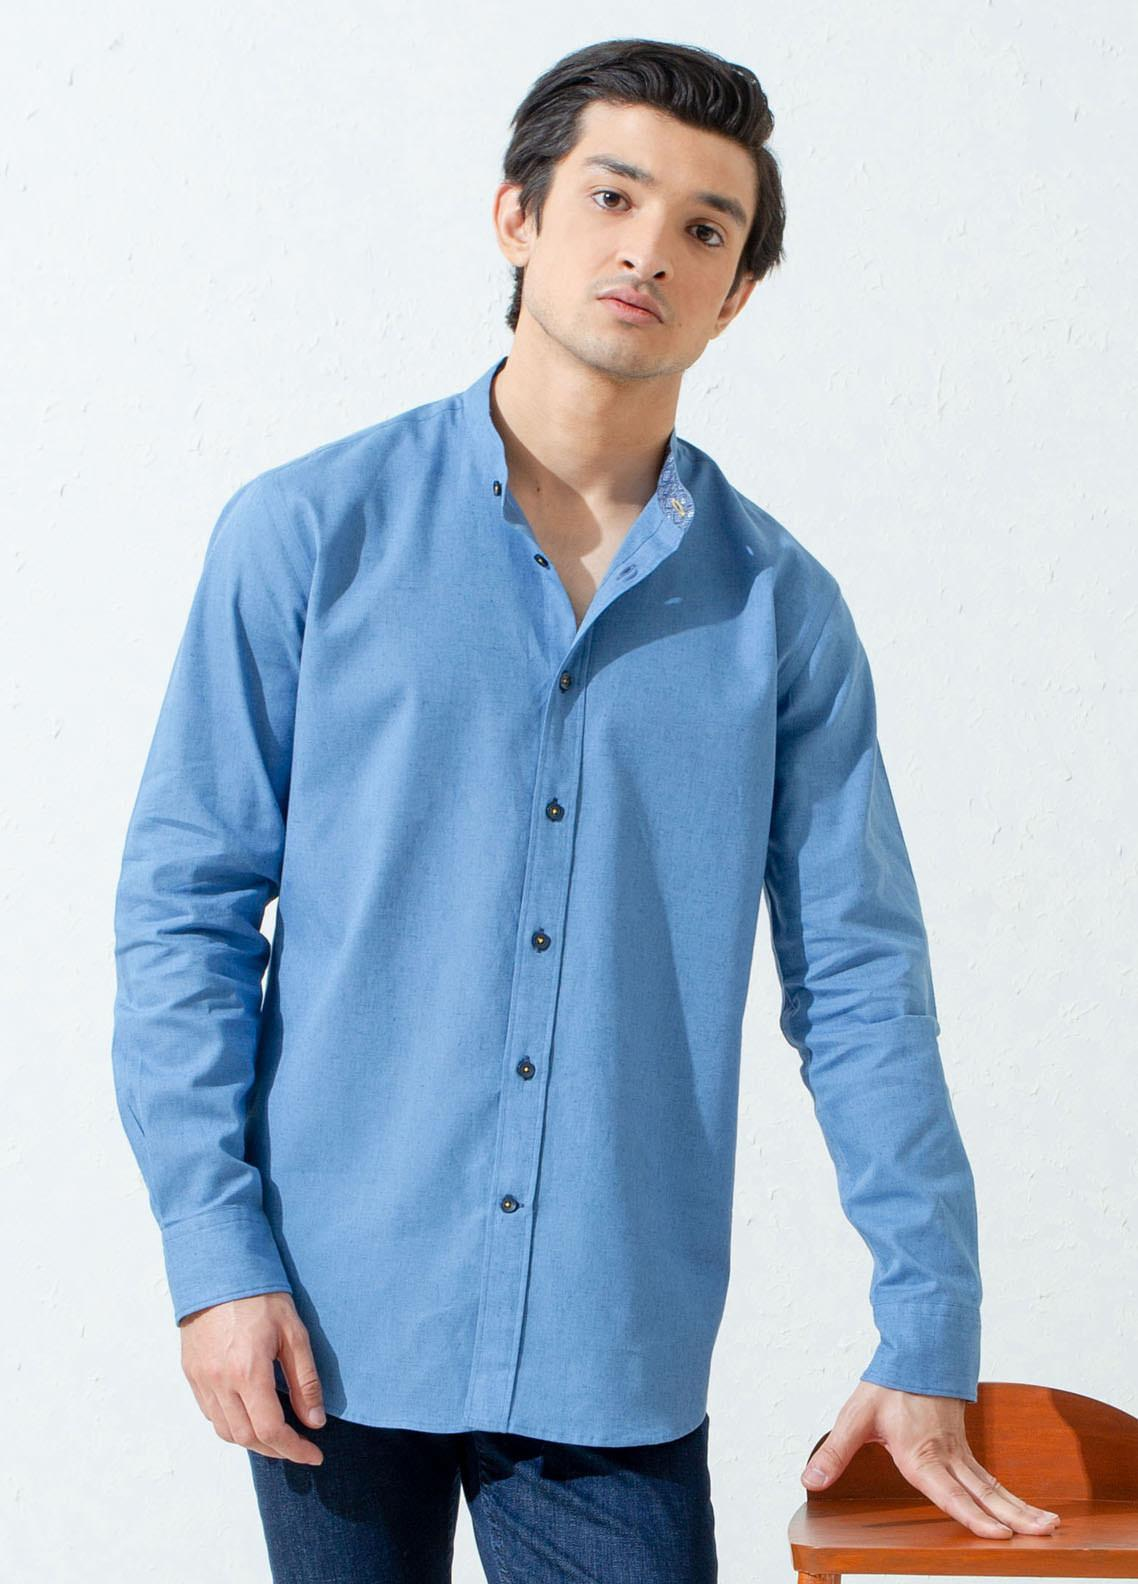 Brumano Cotton Casual Shirts for Men -  BM21SH Blue Linen Mao